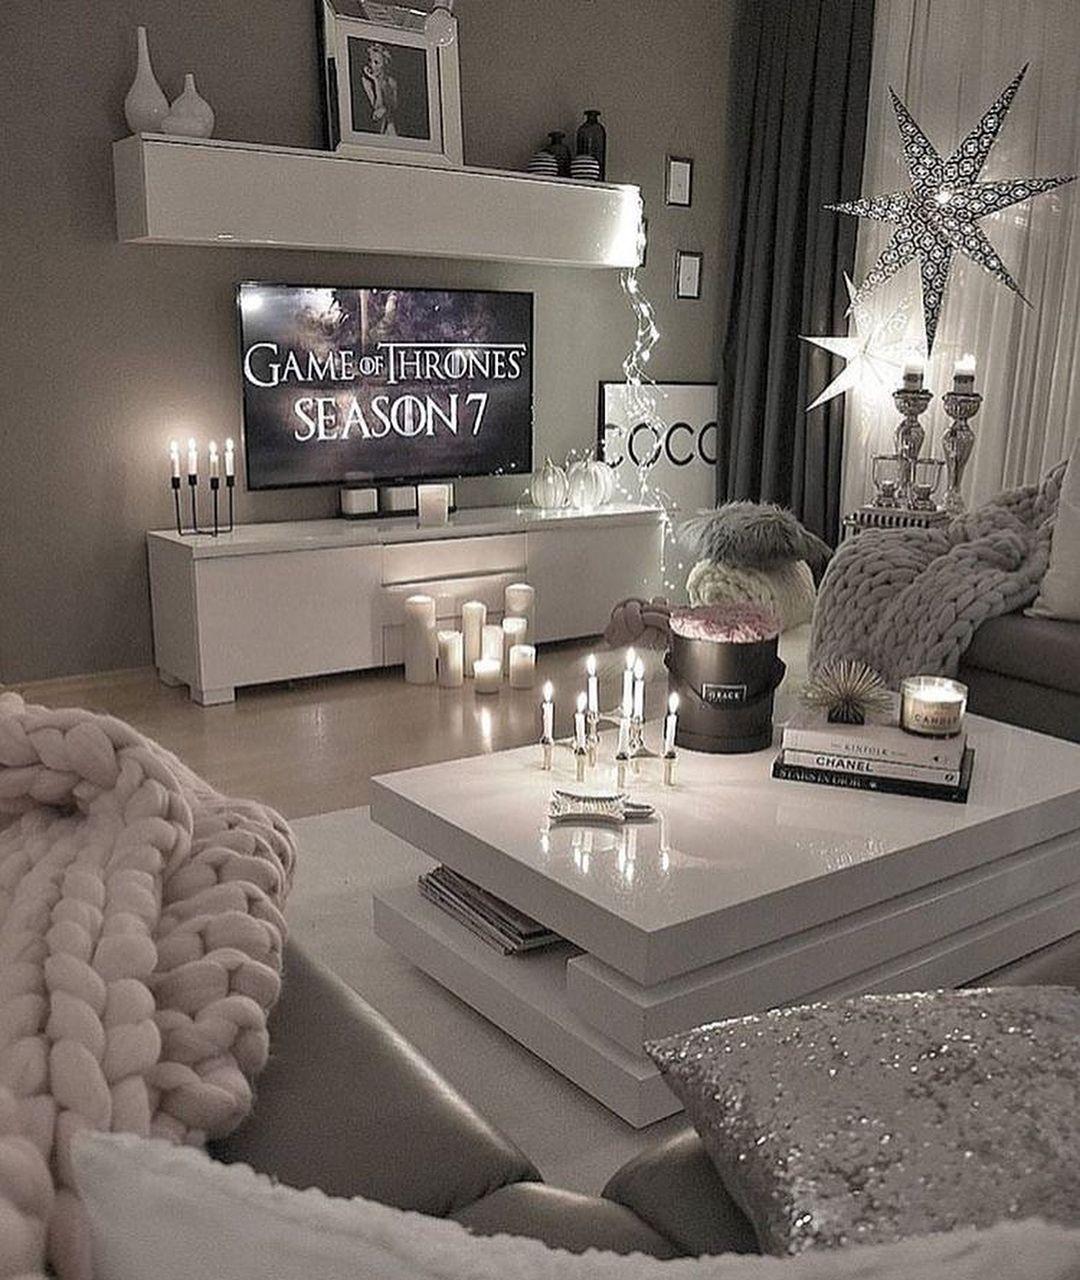 Budget Living Room Design Inspiration: 30 Most Popular Interior Design Styles Explained For 2019